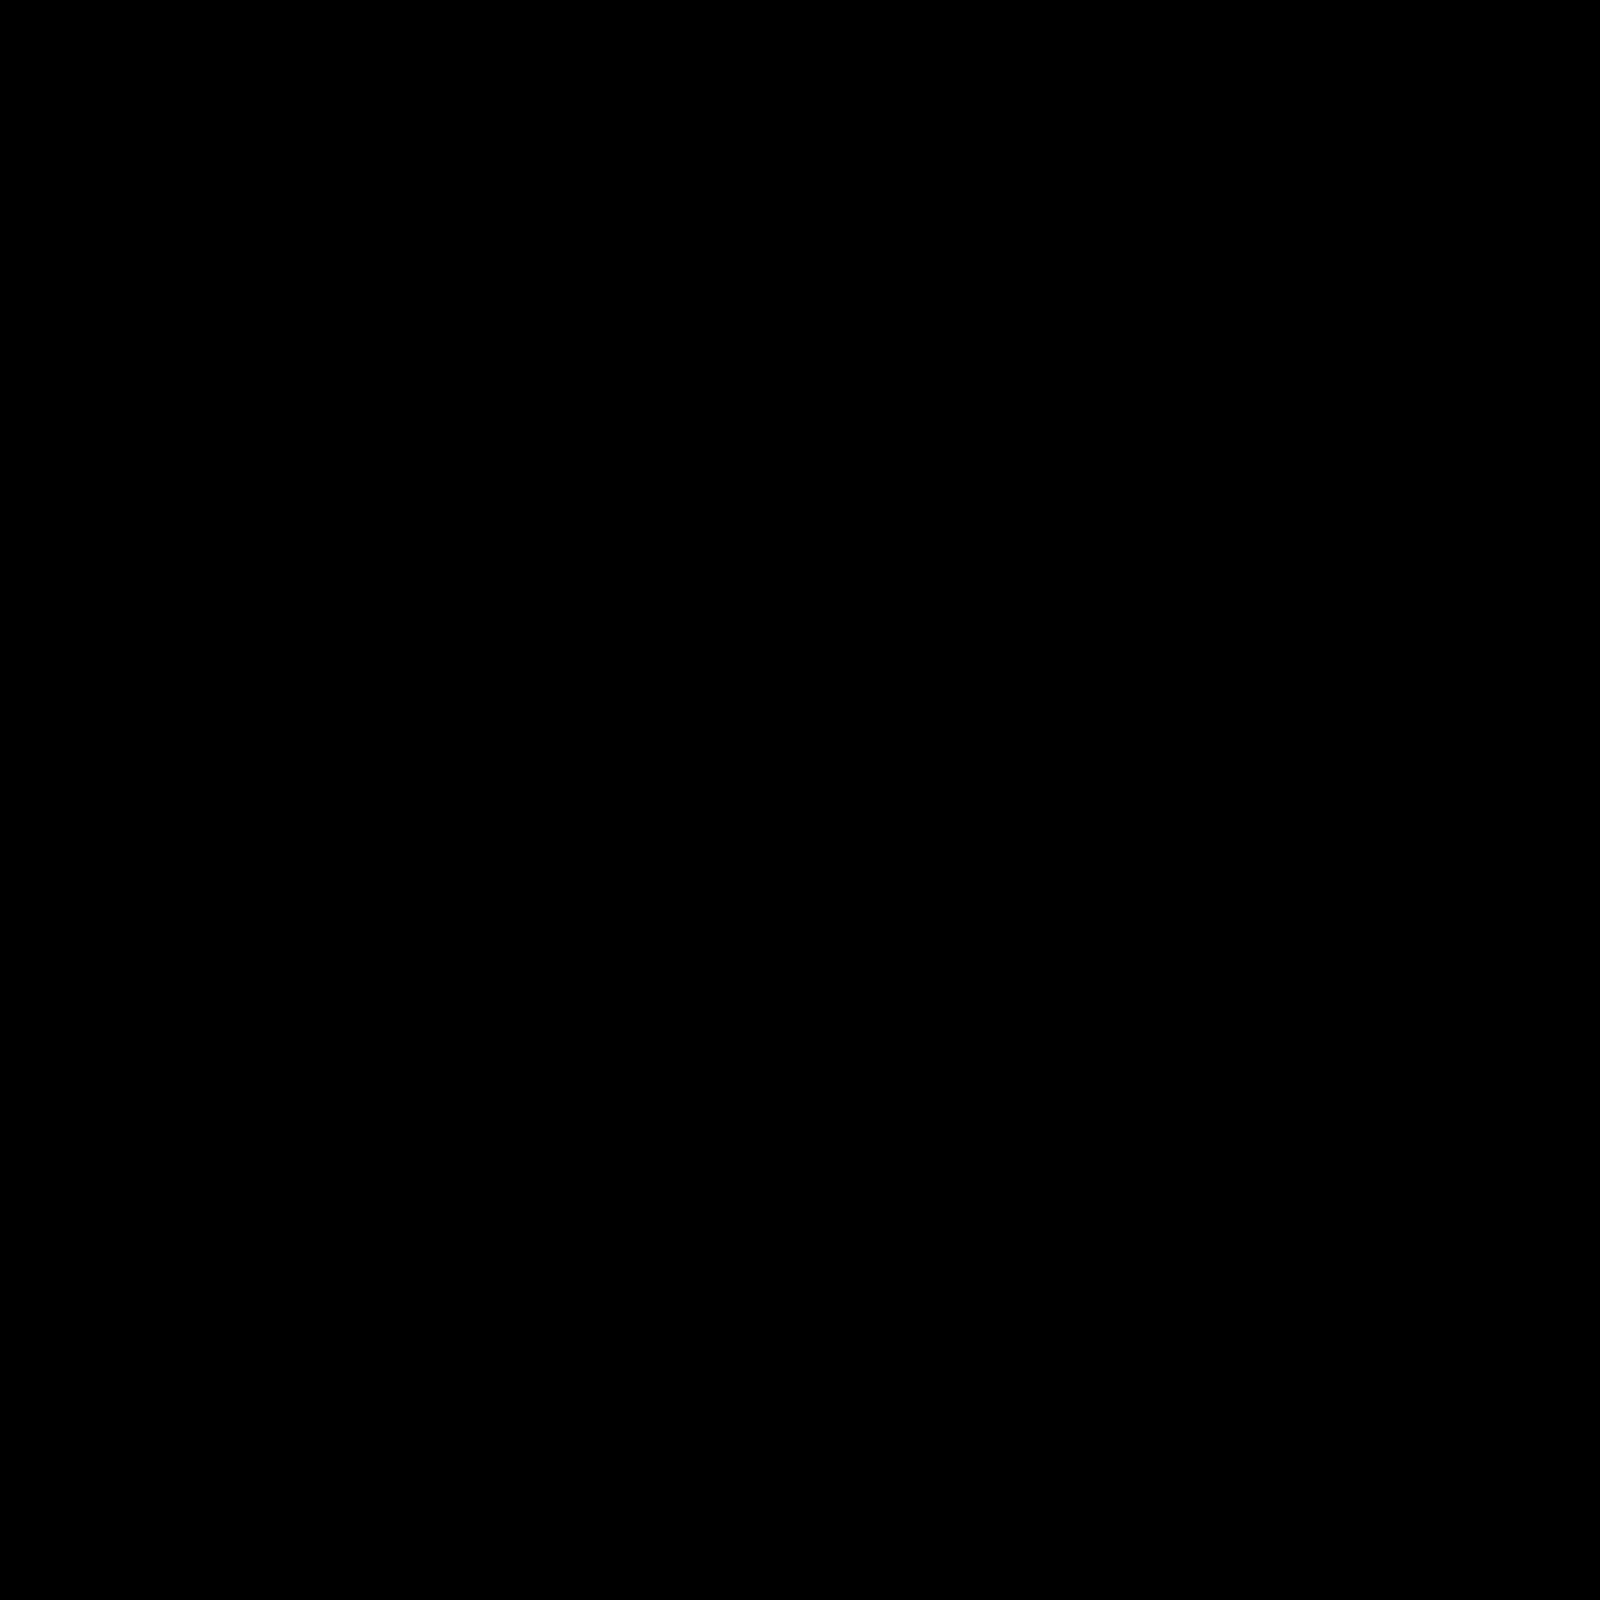 OptinMonster icon